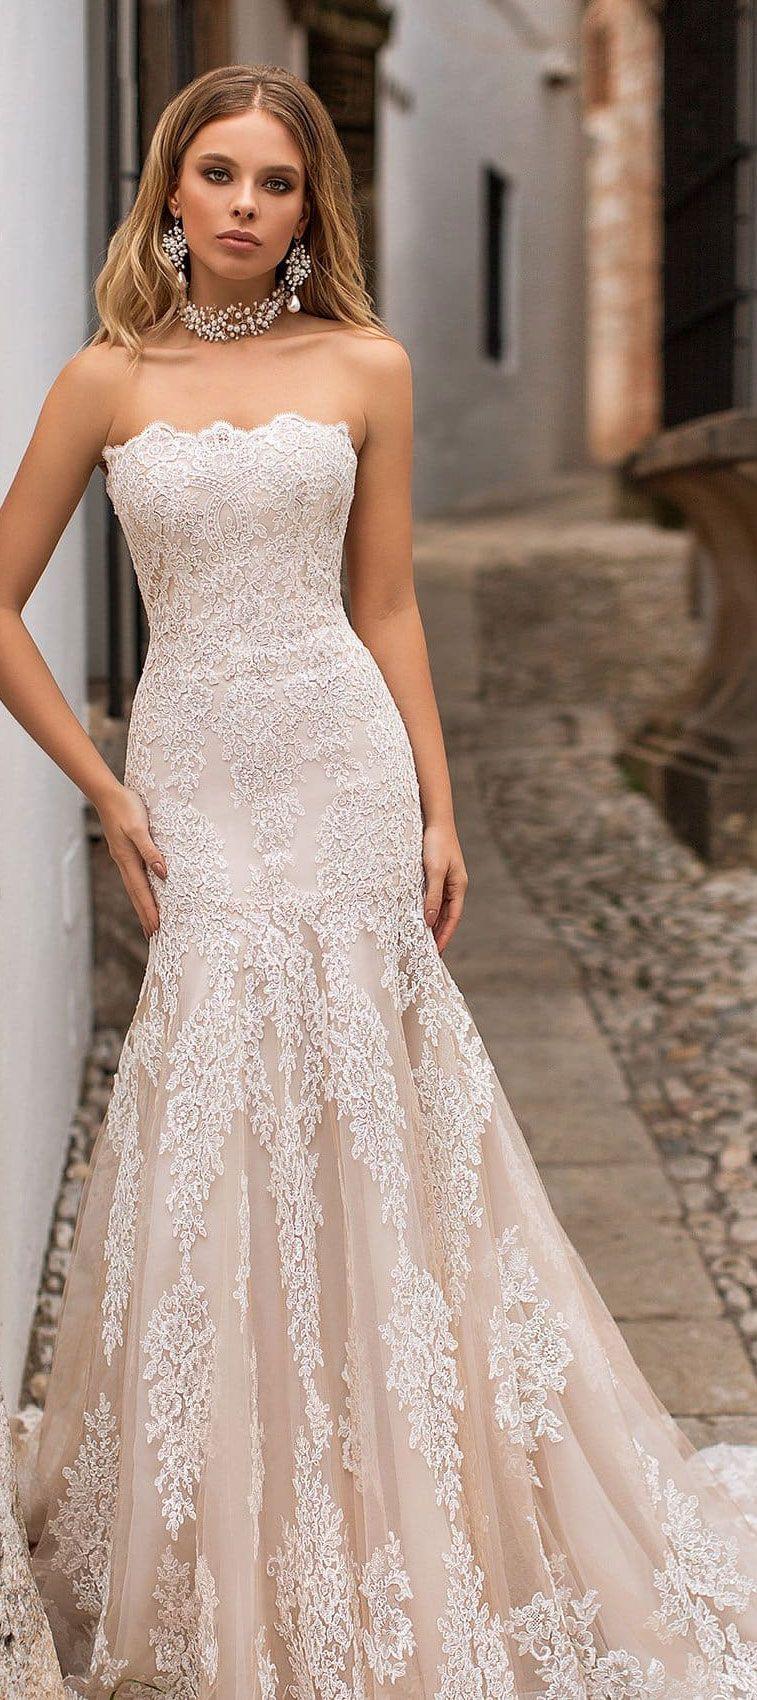 Naviblue Bridal 2018 Wedding Dresses - Dolly Bridal Collection #weddingdress #weddinggown #brideddress #bridalgown #weddingdresses